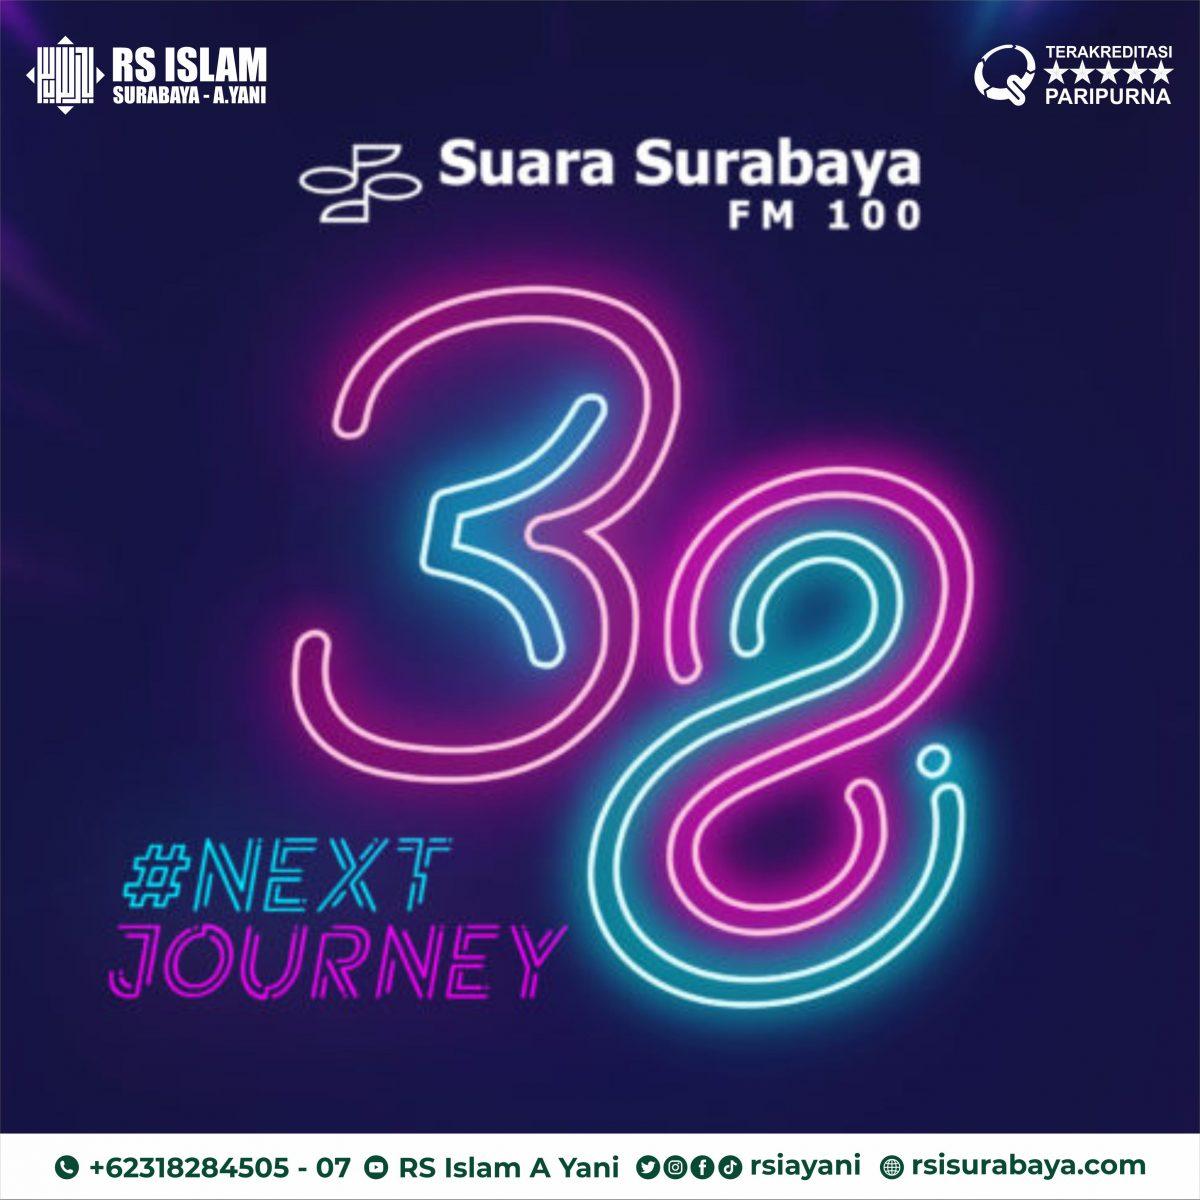 Suara-Surabaya-1200x1200.jpg